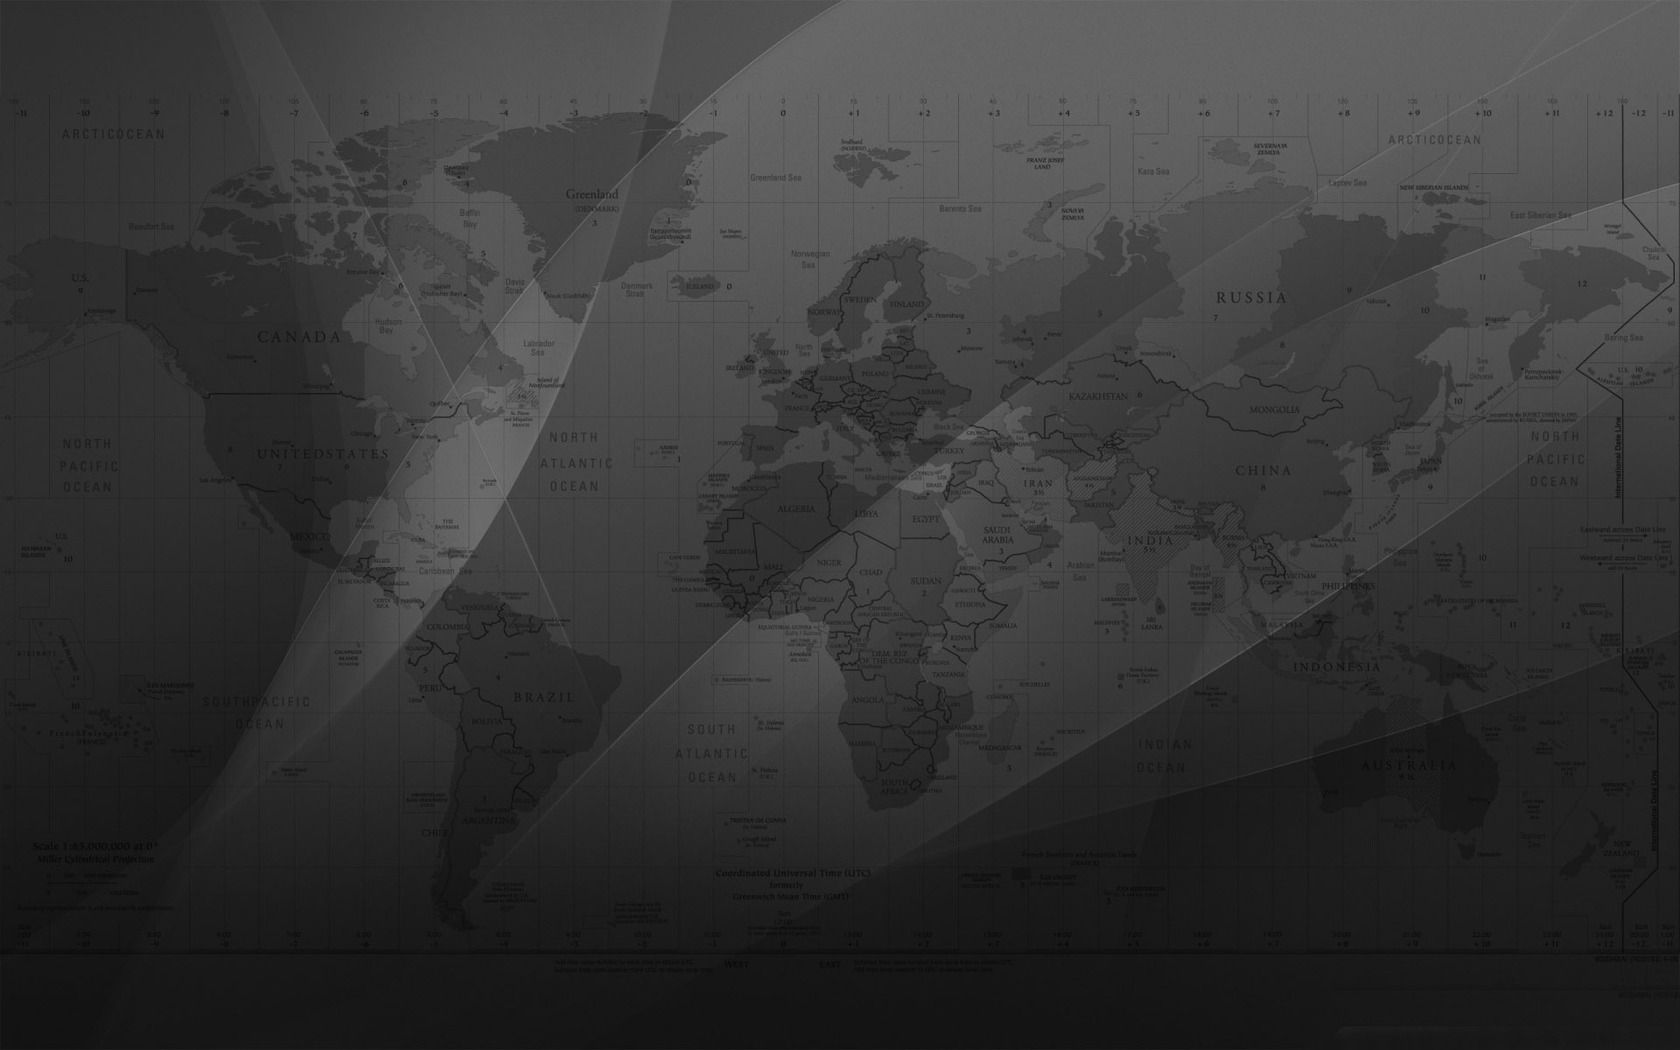 Dark world map httpimashondigital artdark world mapml dark world map httpimashondigital art gumiabroncs Images